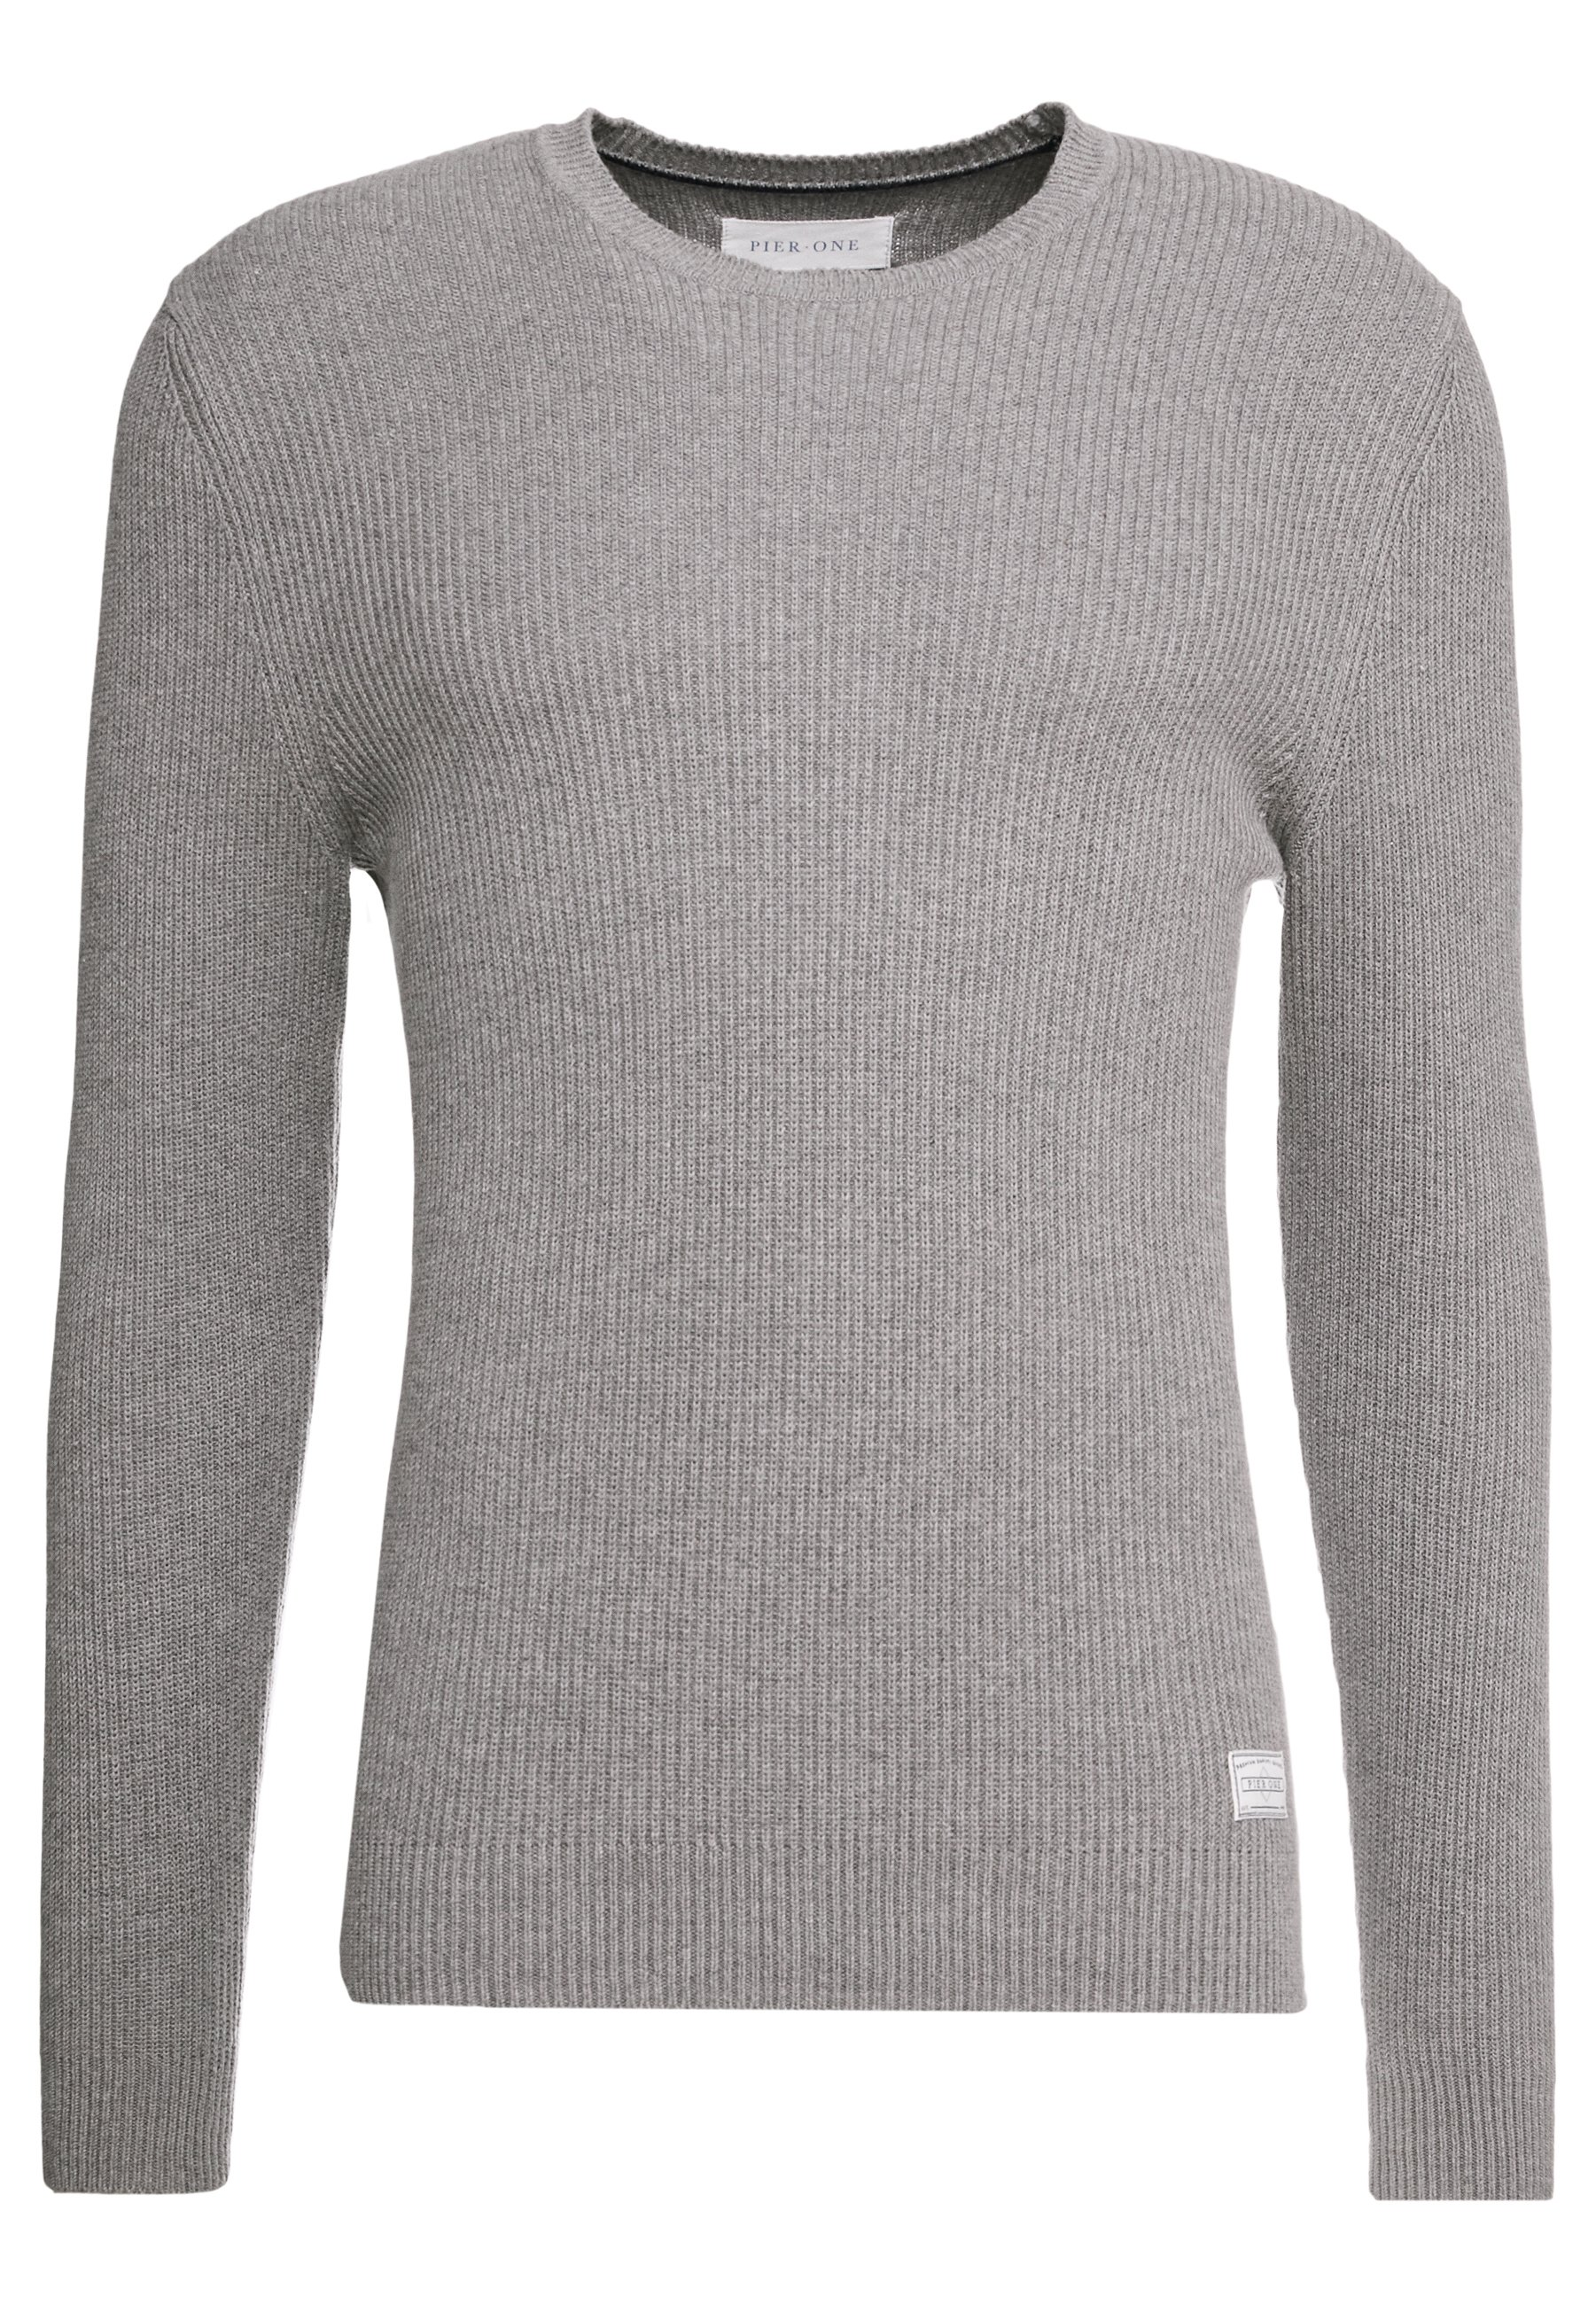 Pier One Pullover - Mottled Grey